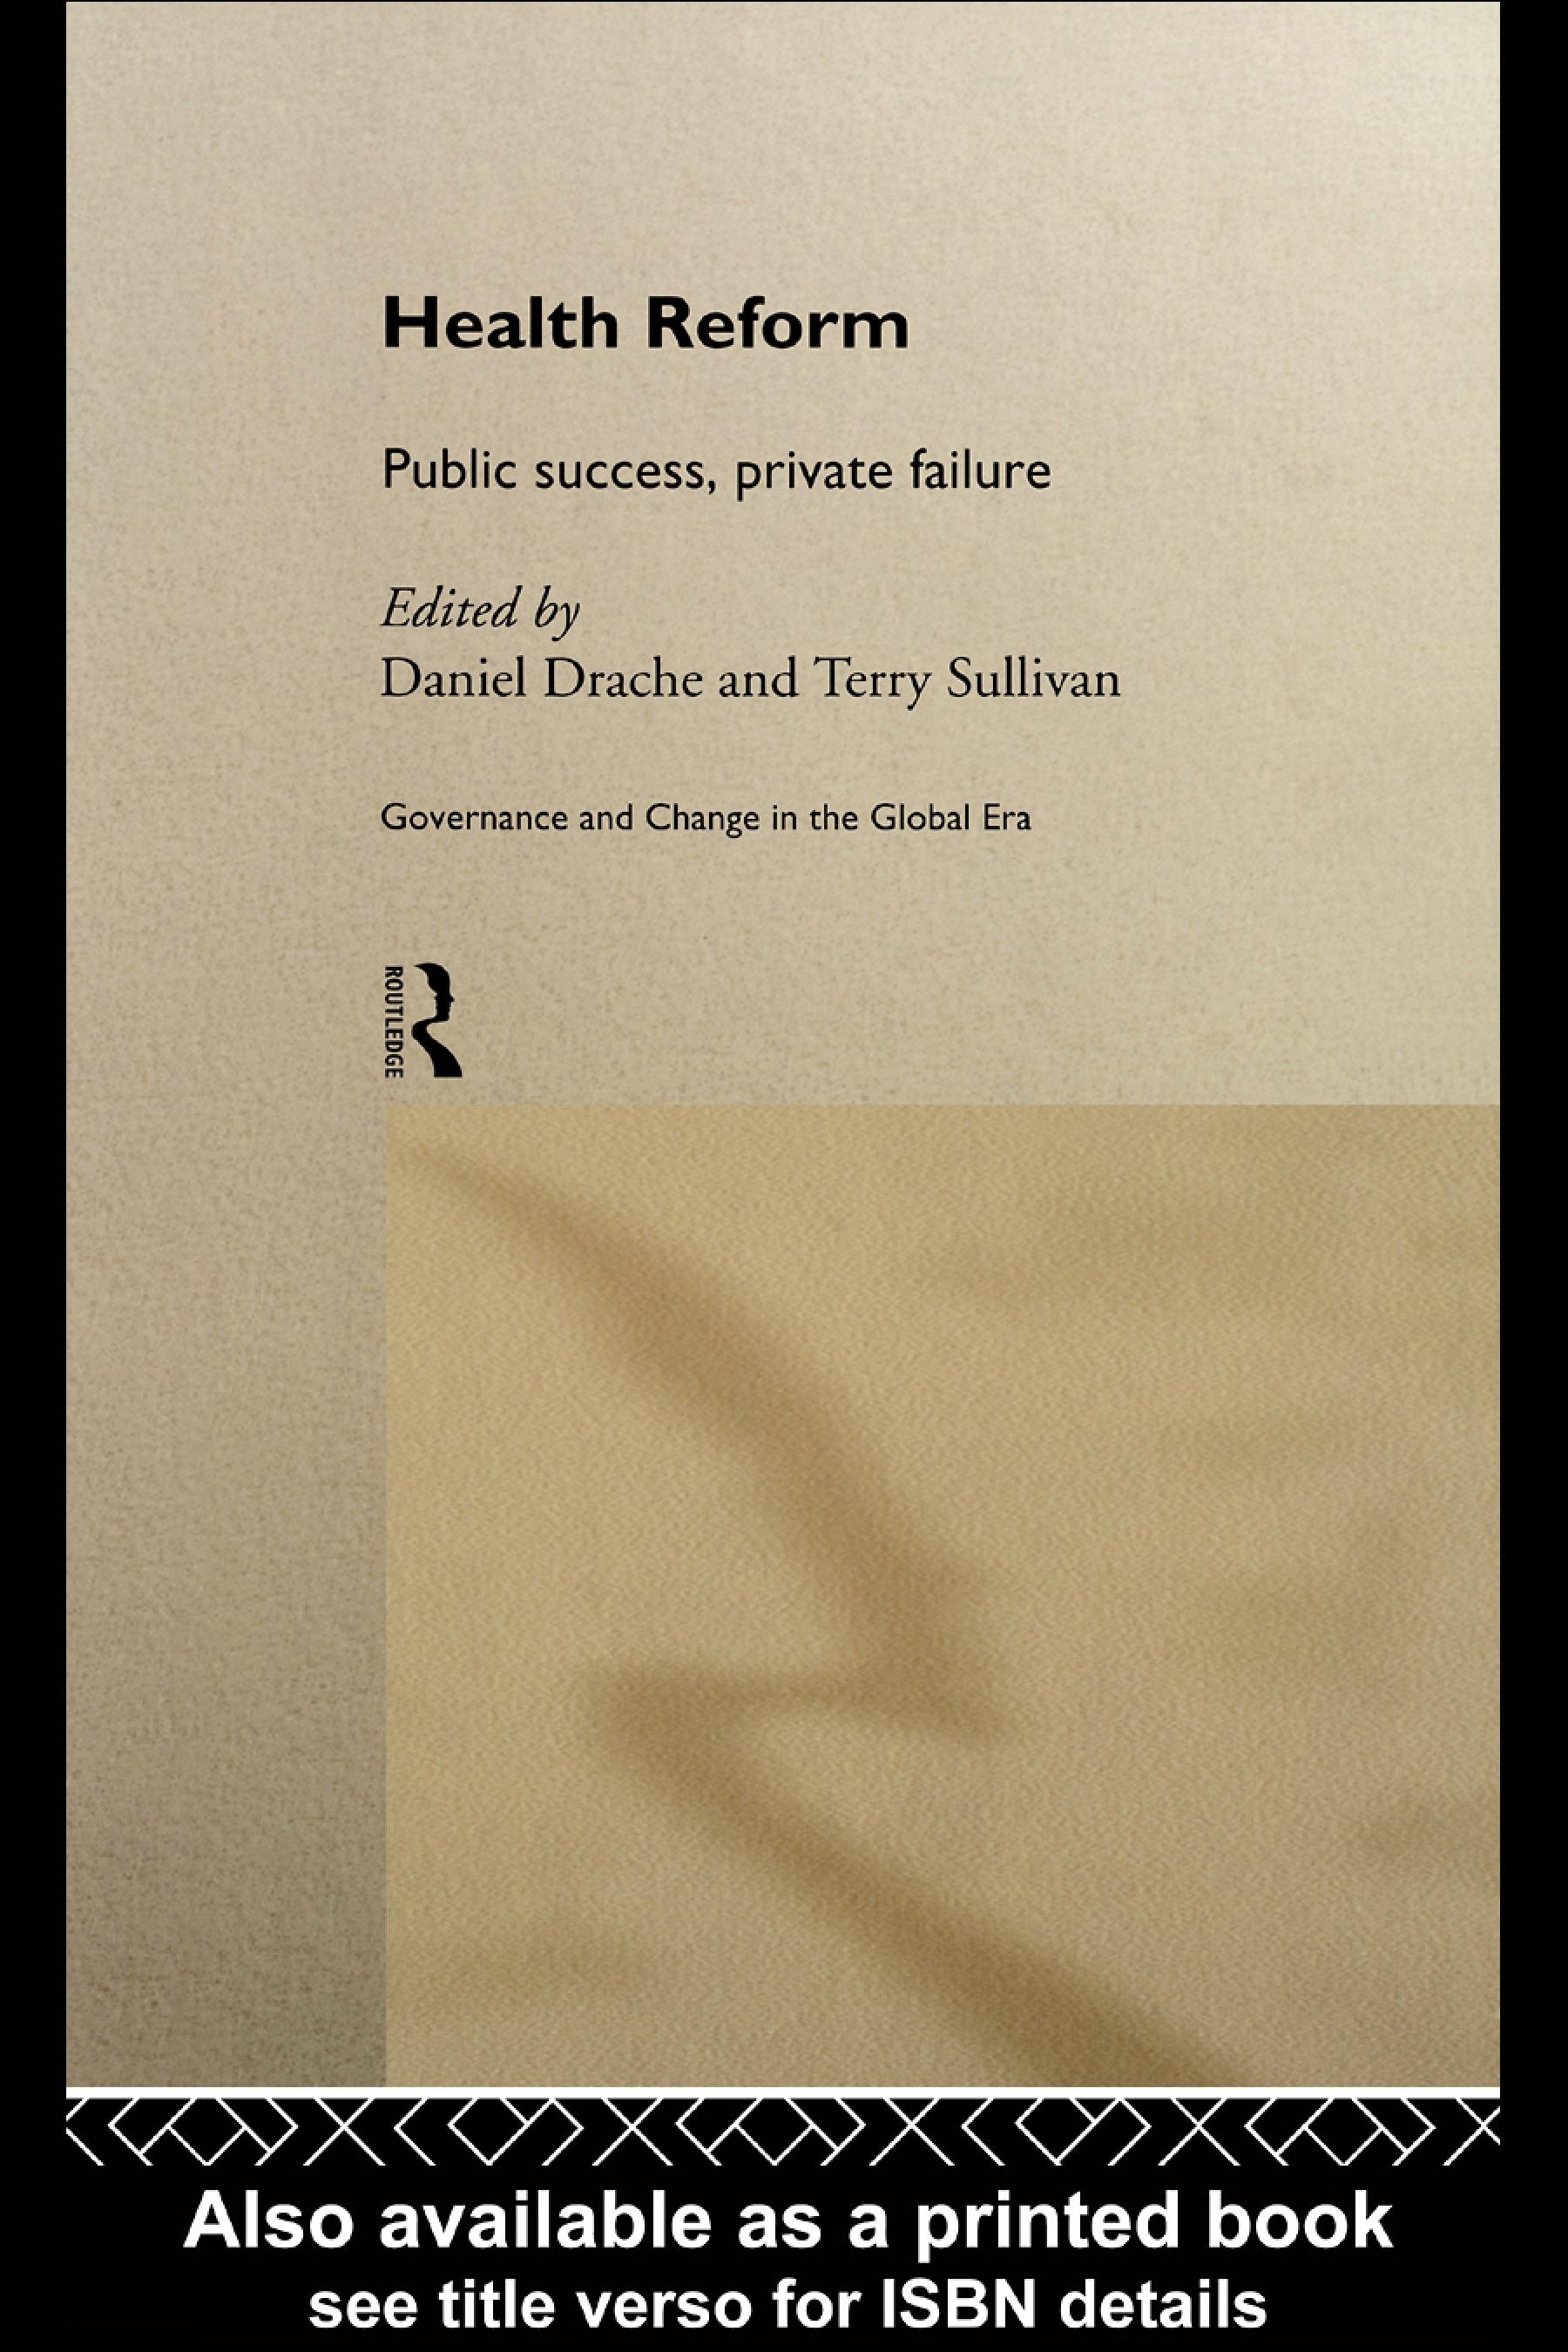 Health Reform: Public Success, Private Failure